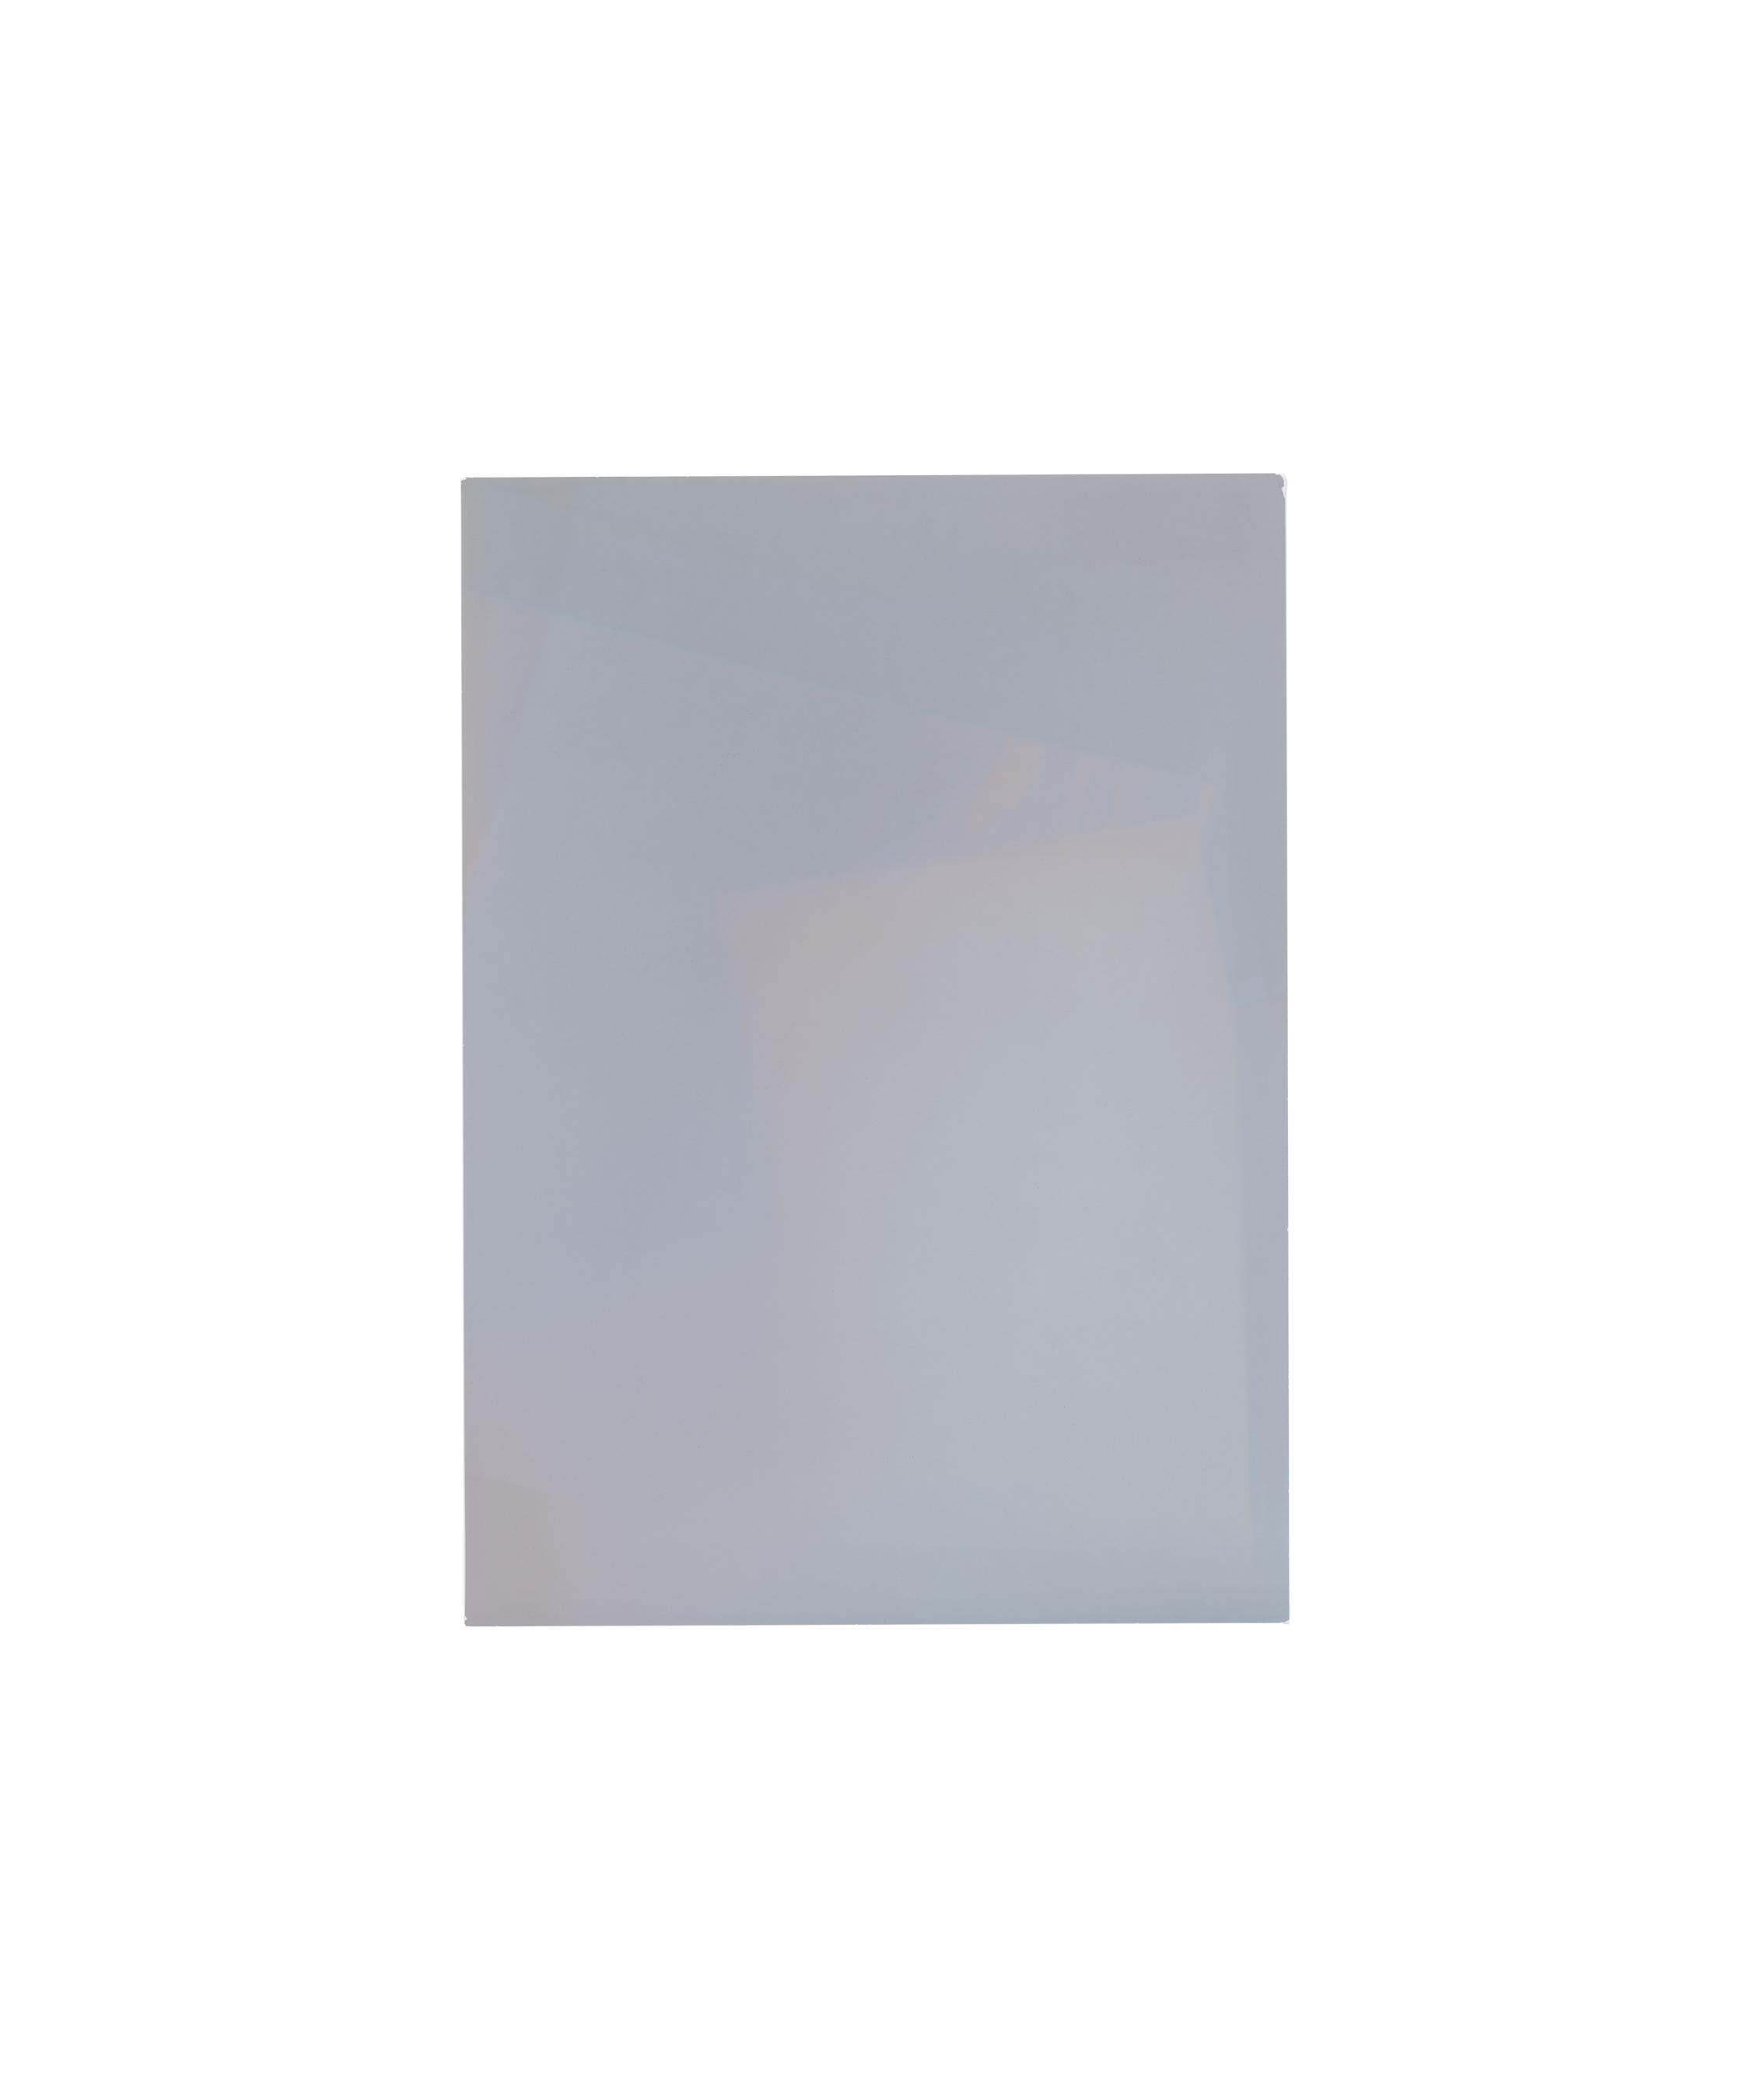 Photogram_3.jpg